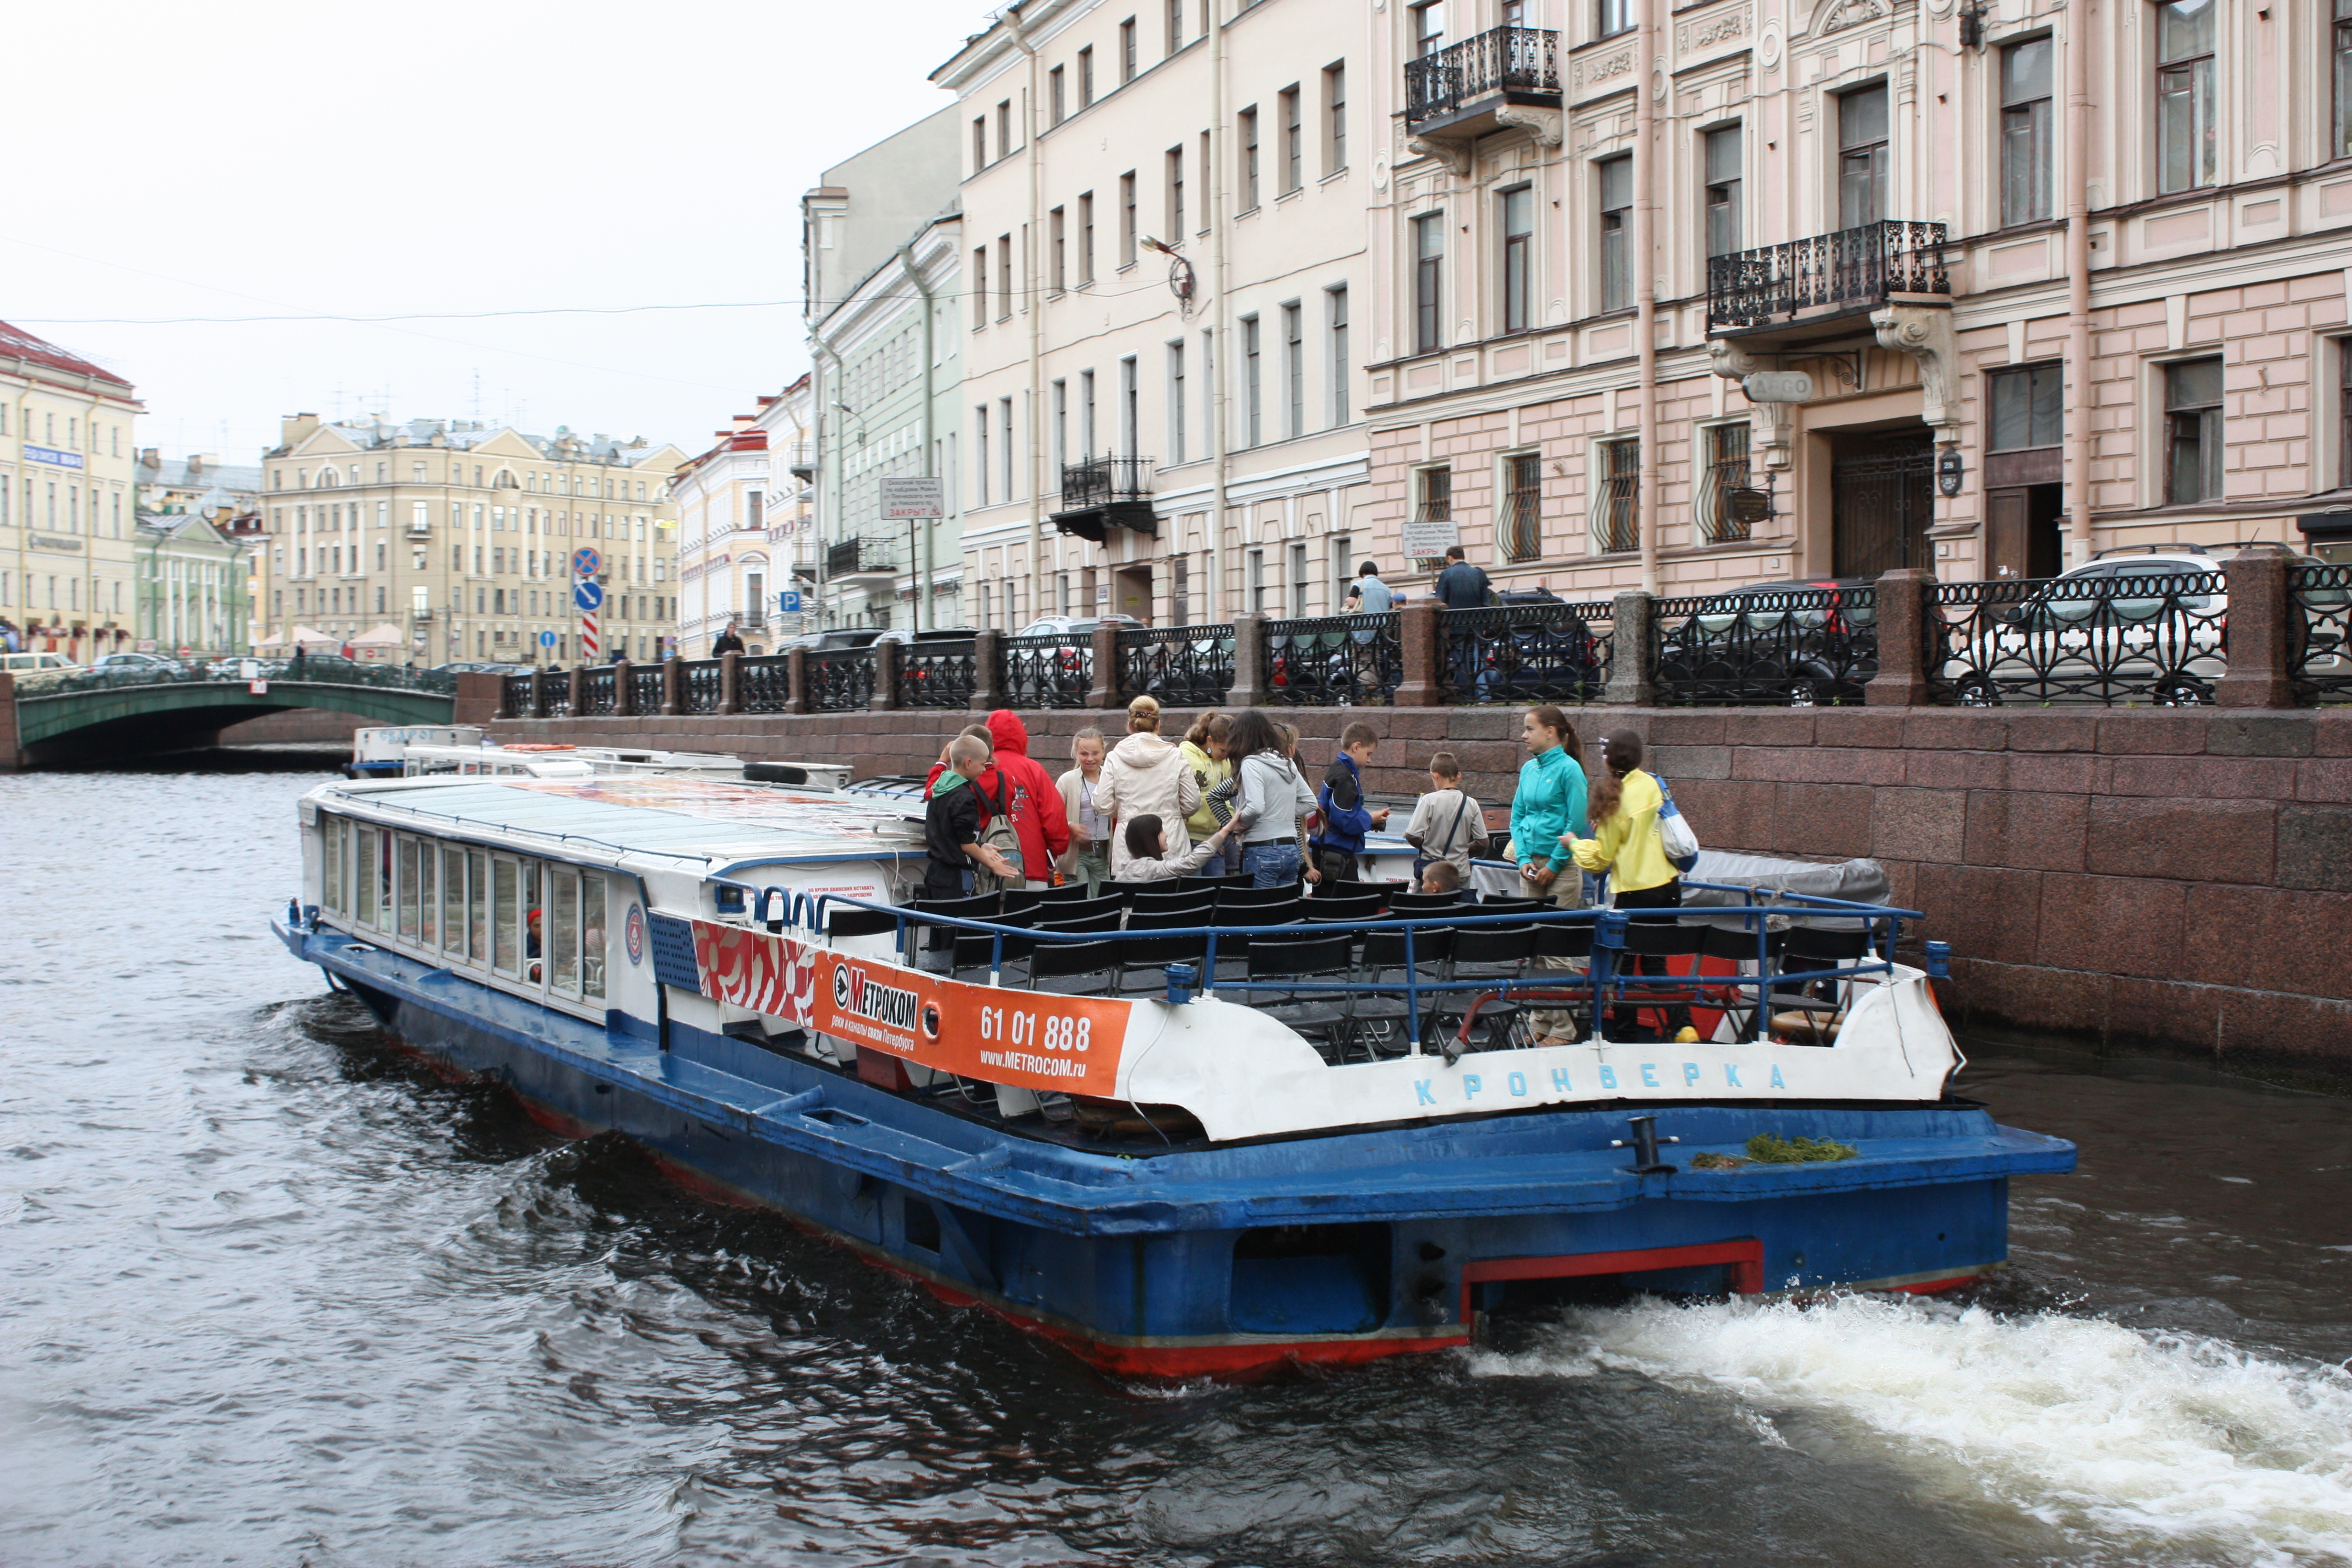 Saint Petersburg 2009 tourist pictures 0268.JPG